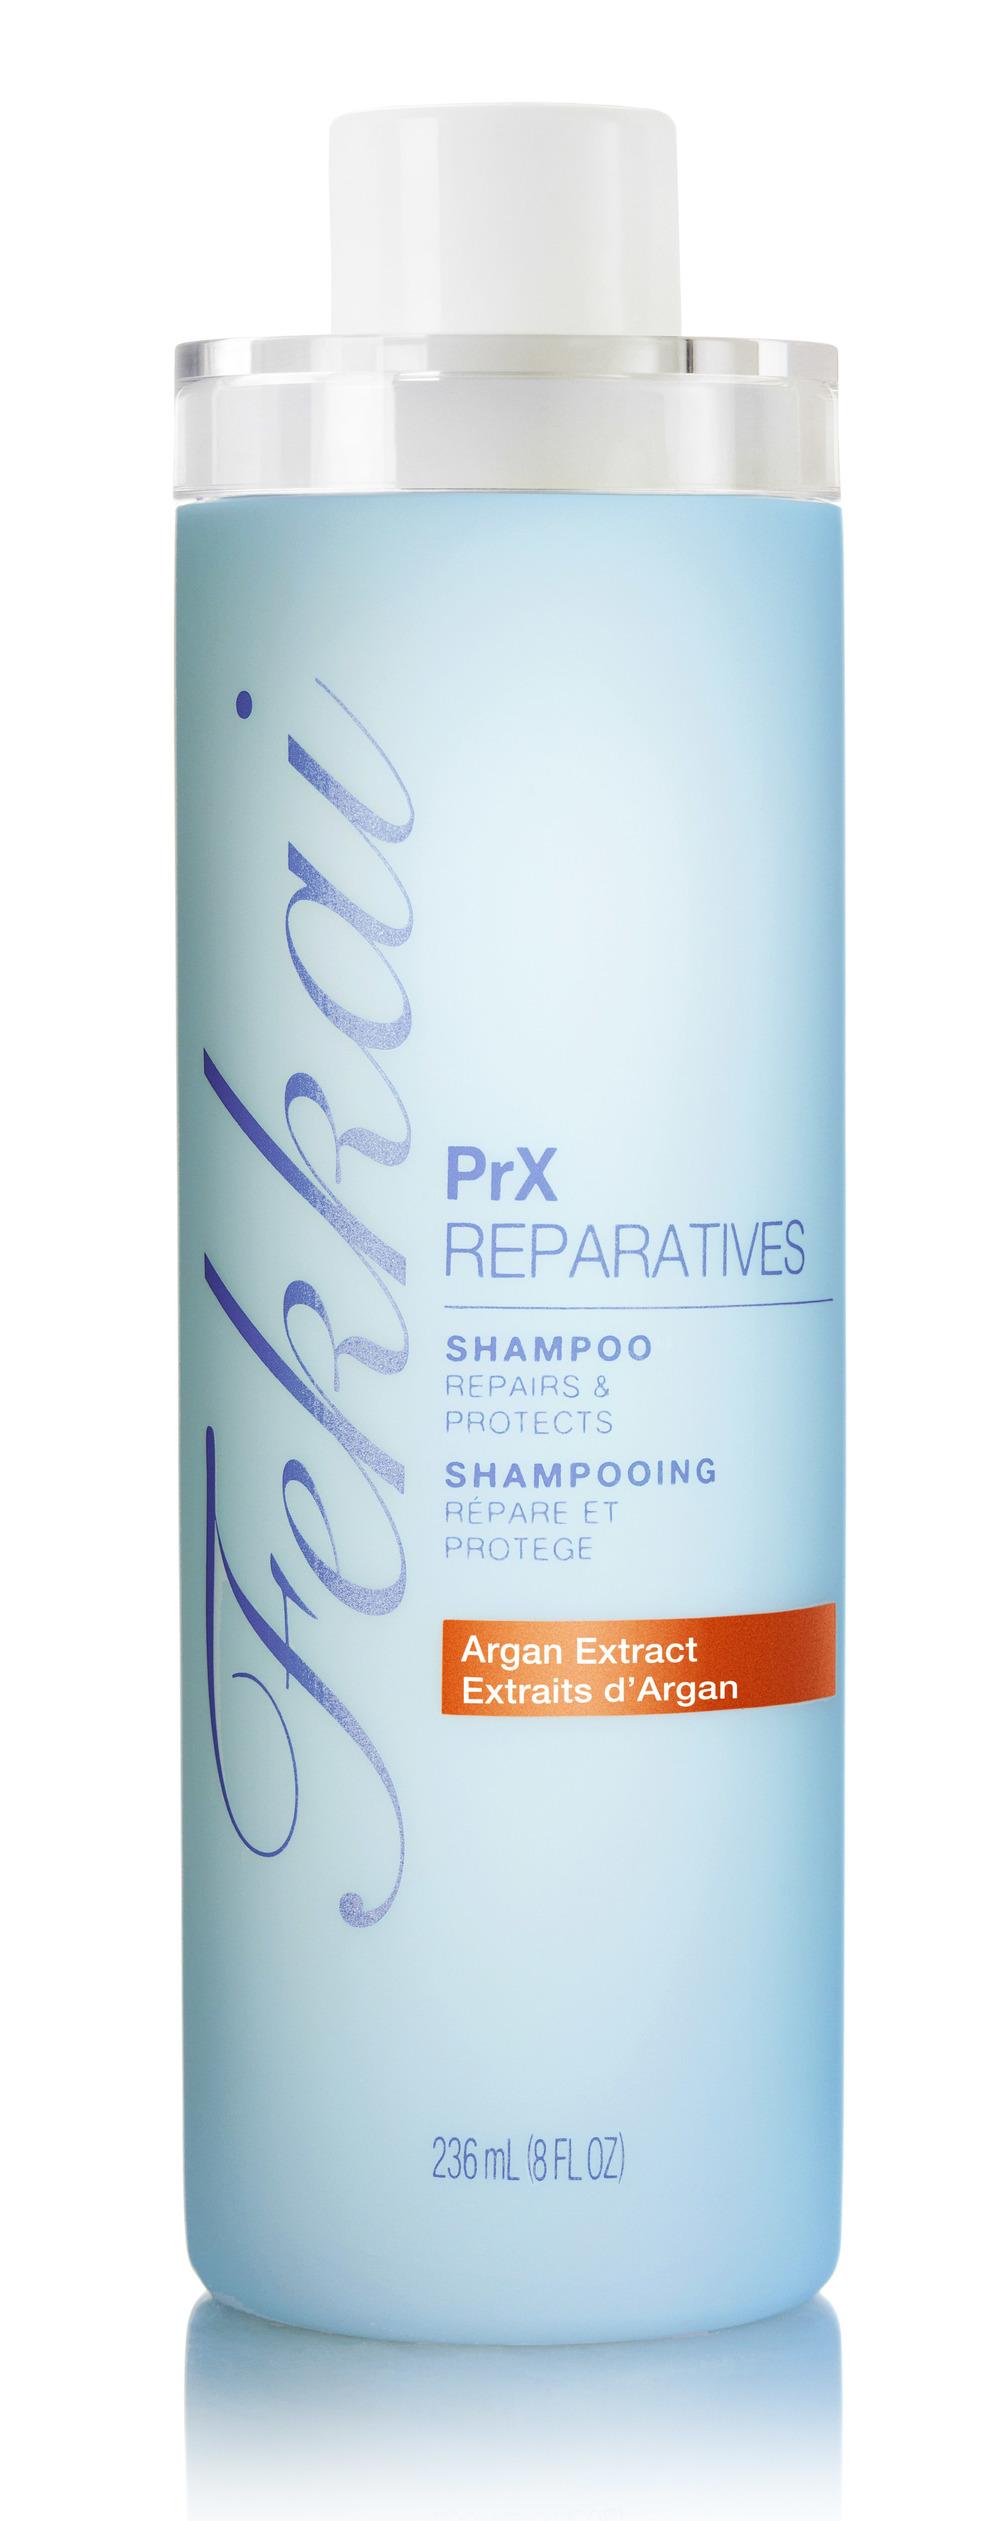 Frederic Fekkai PrX Shampoo